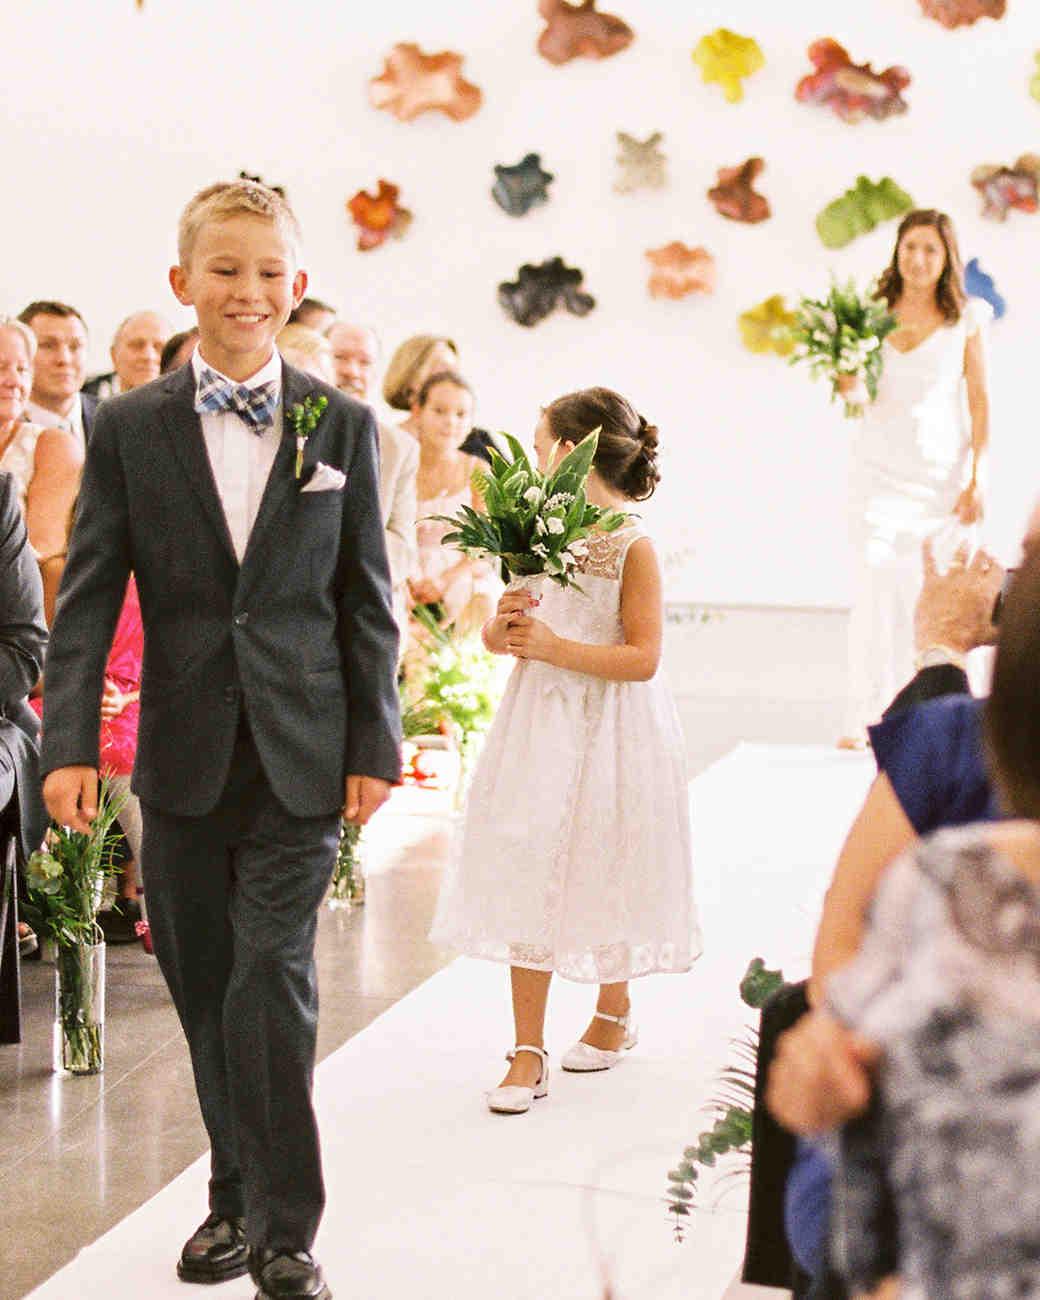 sydney-mike-wedding-ceremony-44-s111778-0215.jpg